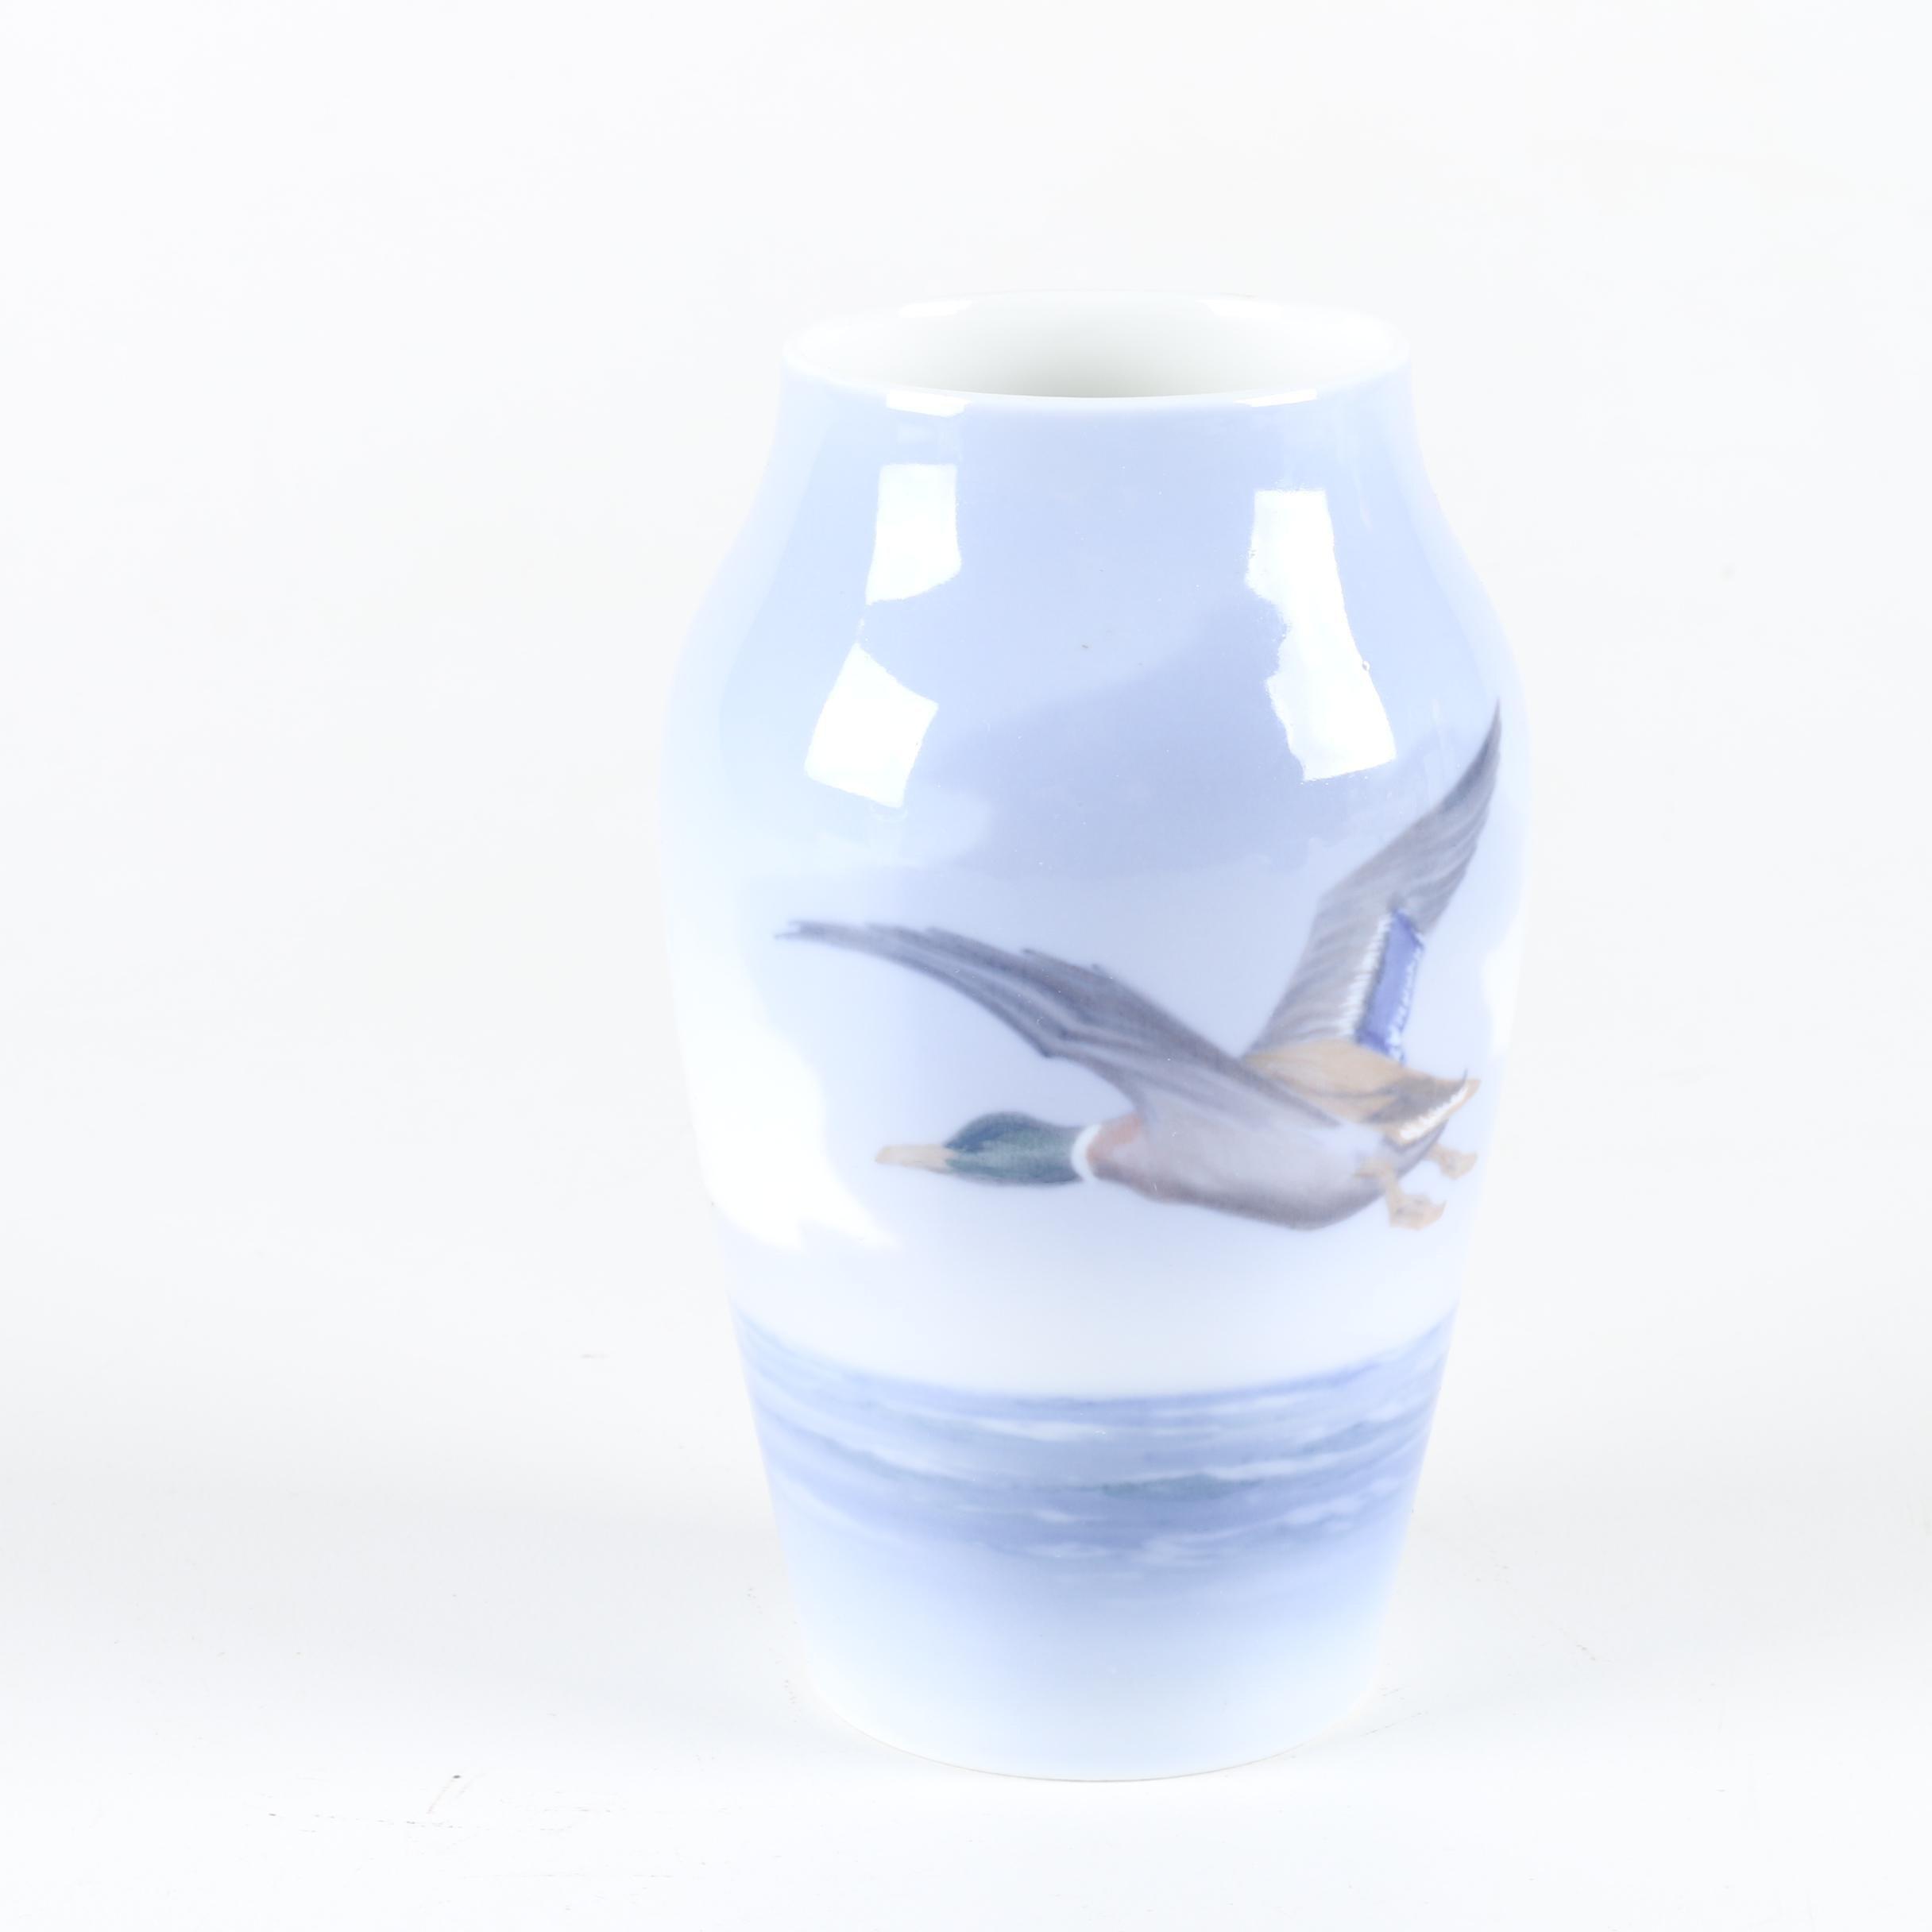 1956 Royal Copenhagen Porcelain Vase